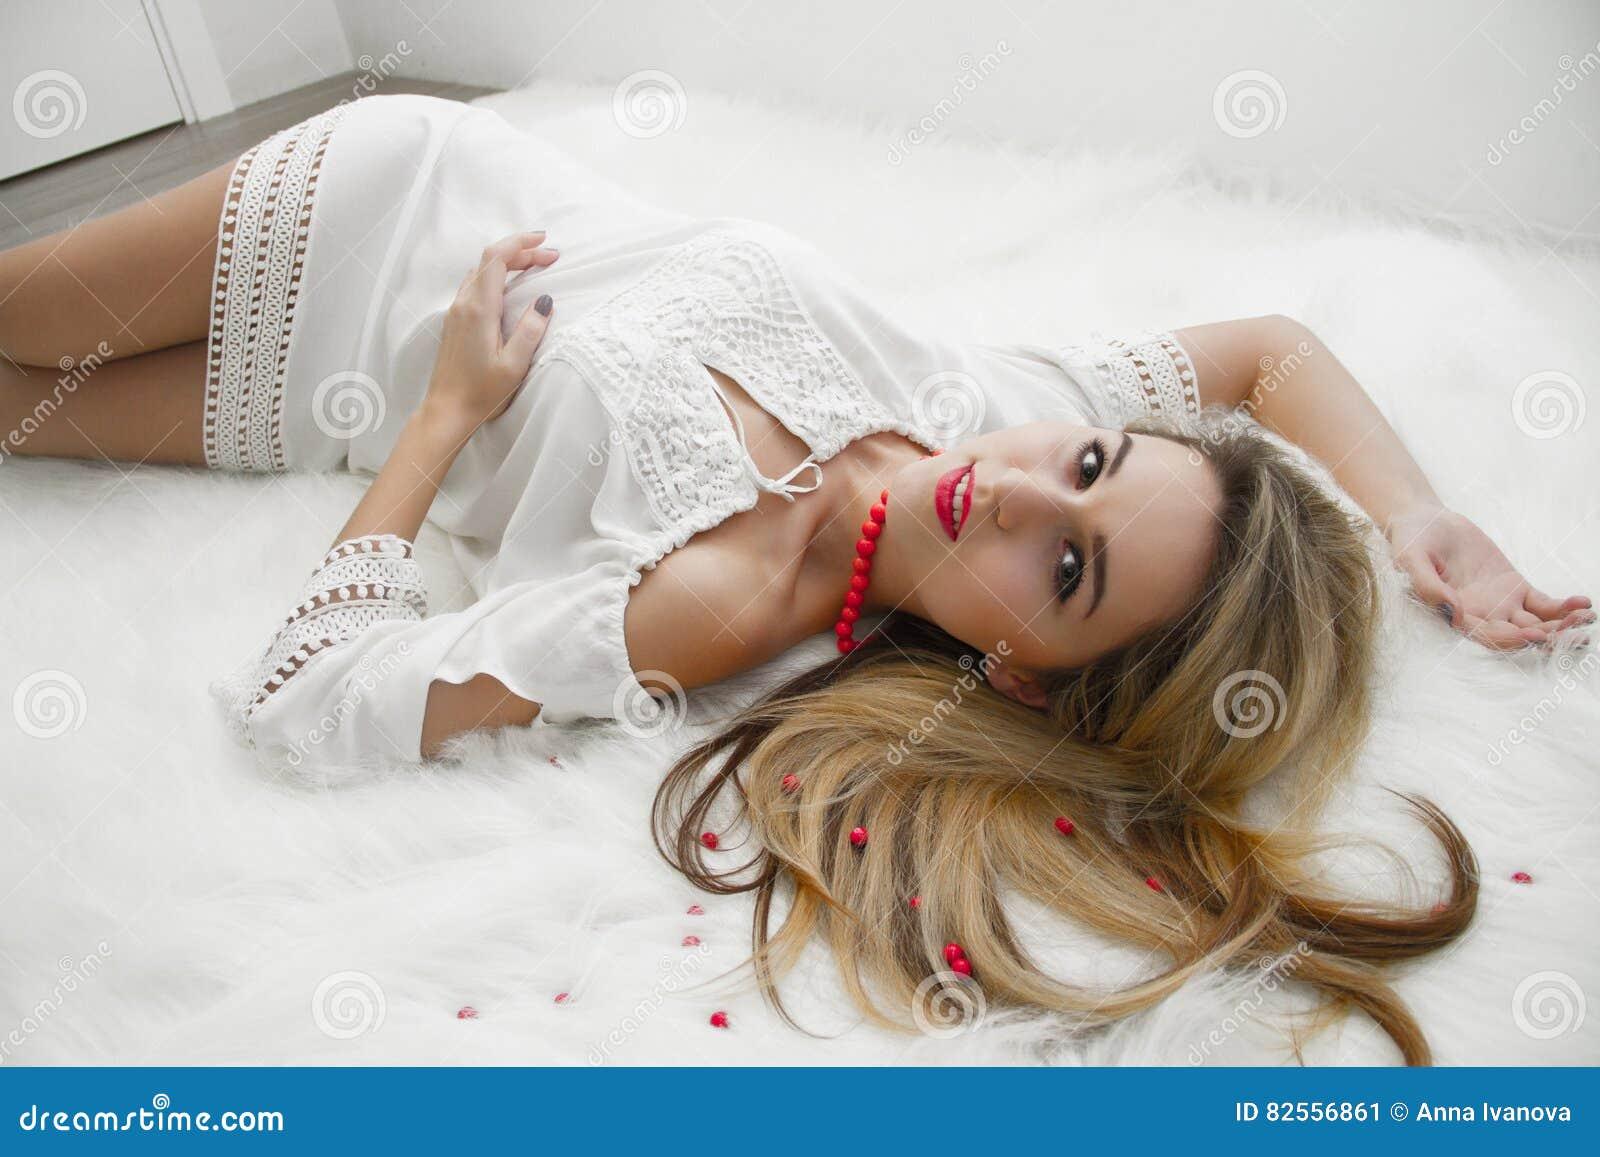 Блондинка в спальнп фото 410-907